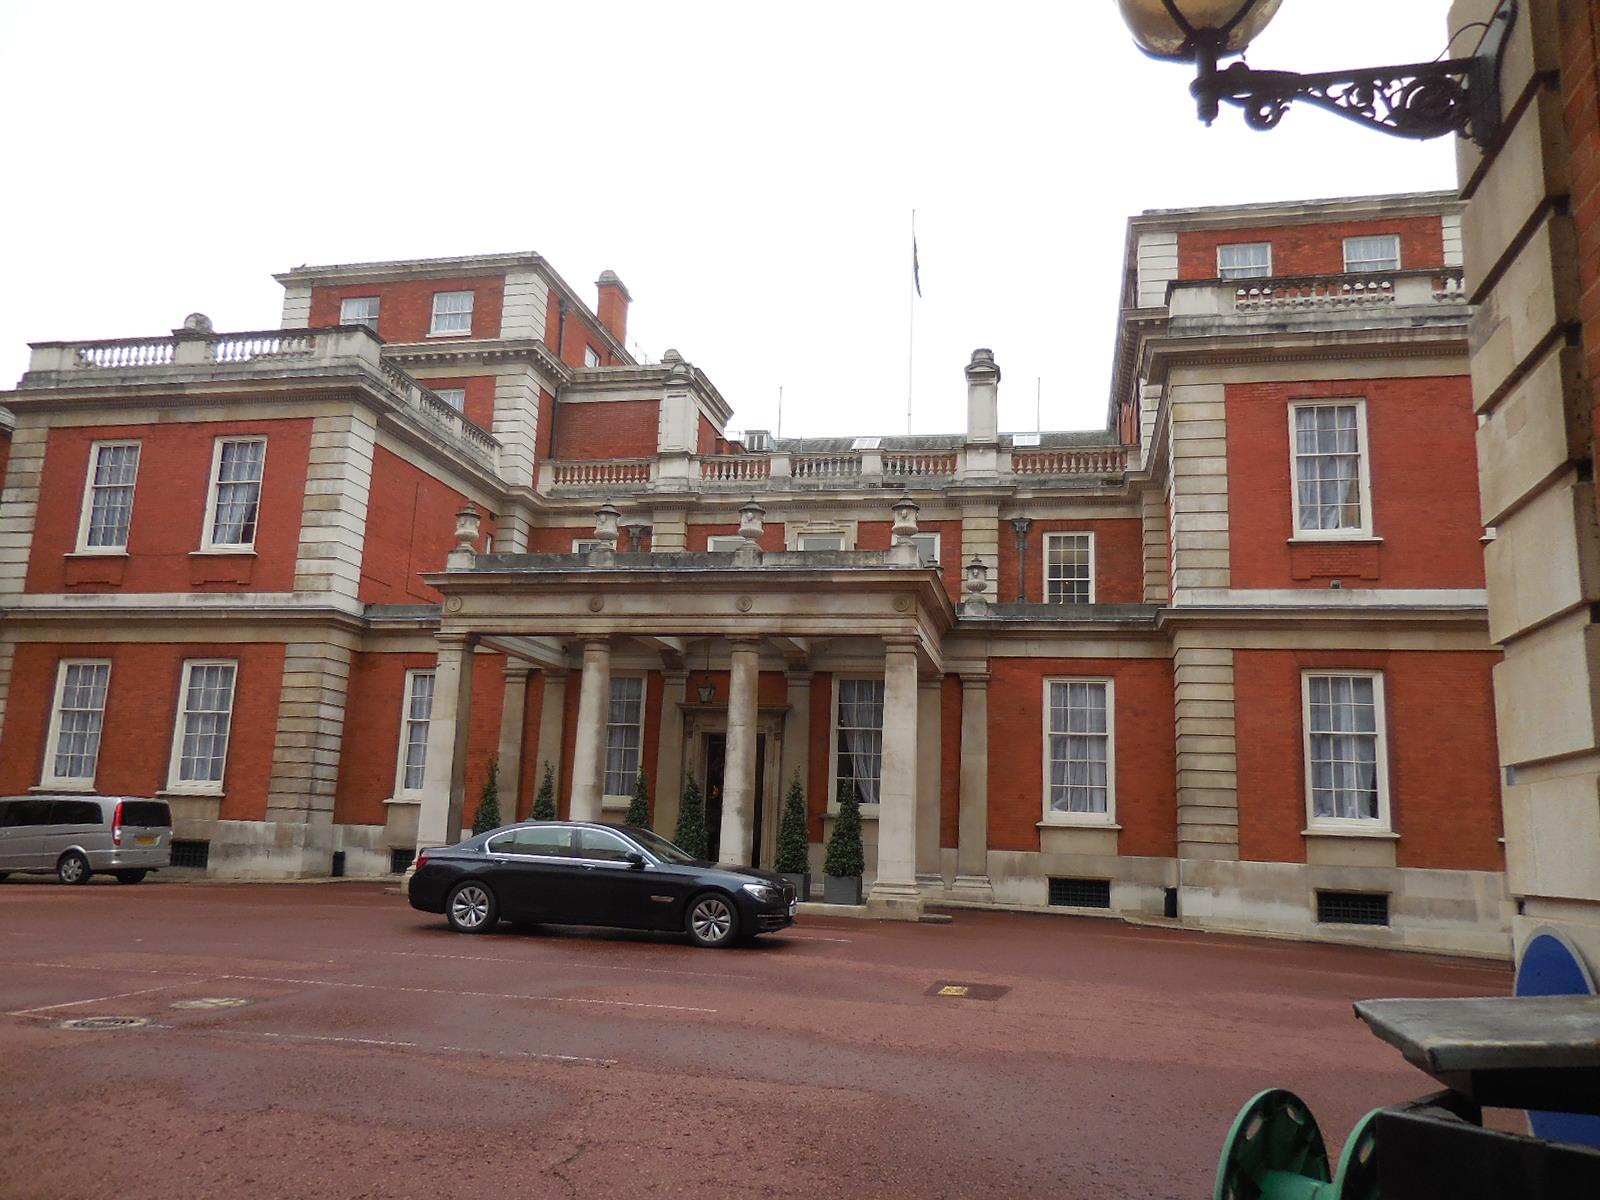 OPEN CITY DAYS: MARLBOROUGH HOUSE – Number One London